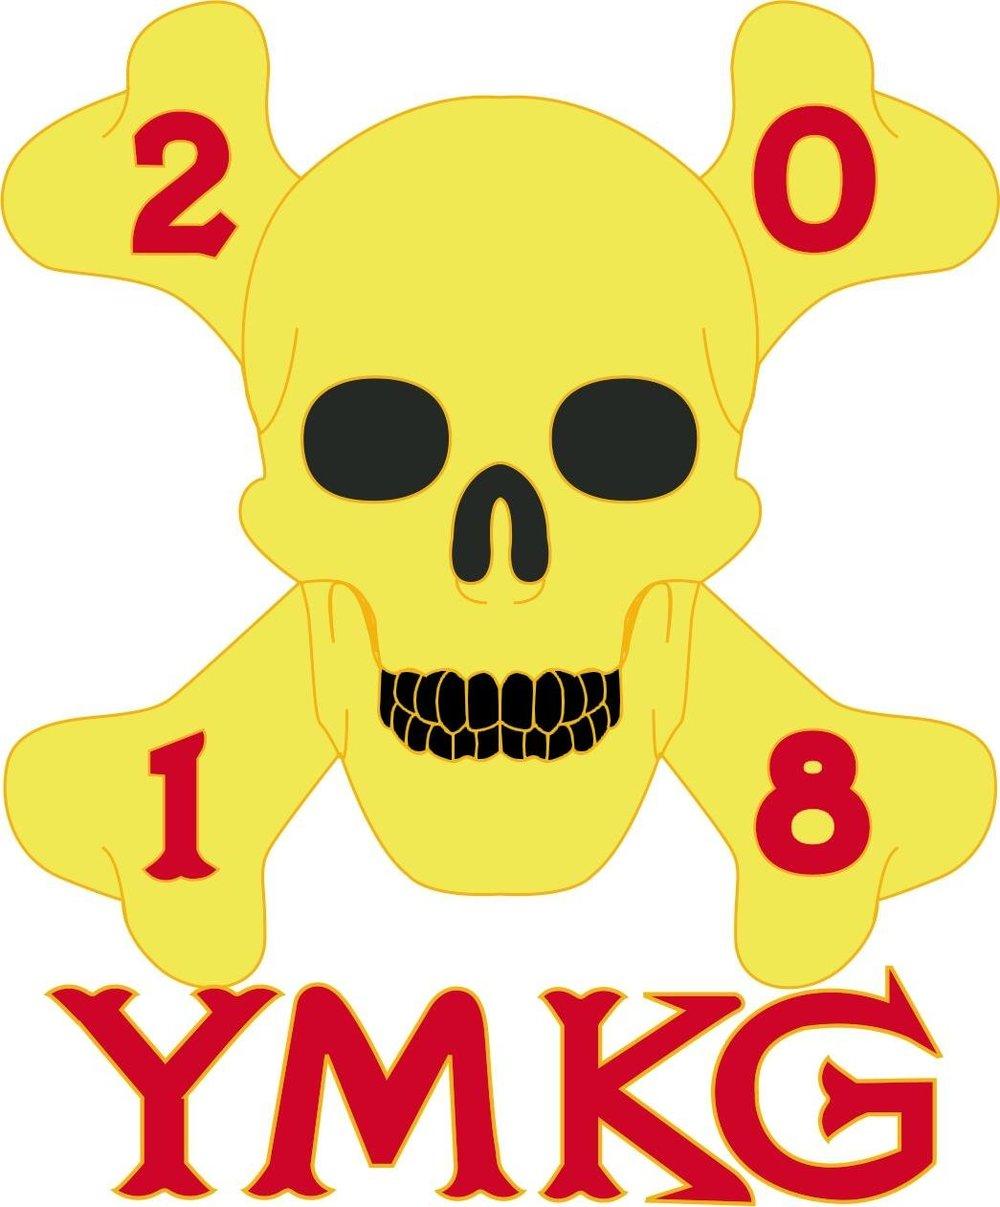 2018-YMKG-jpg-hr-1 logo.jpg